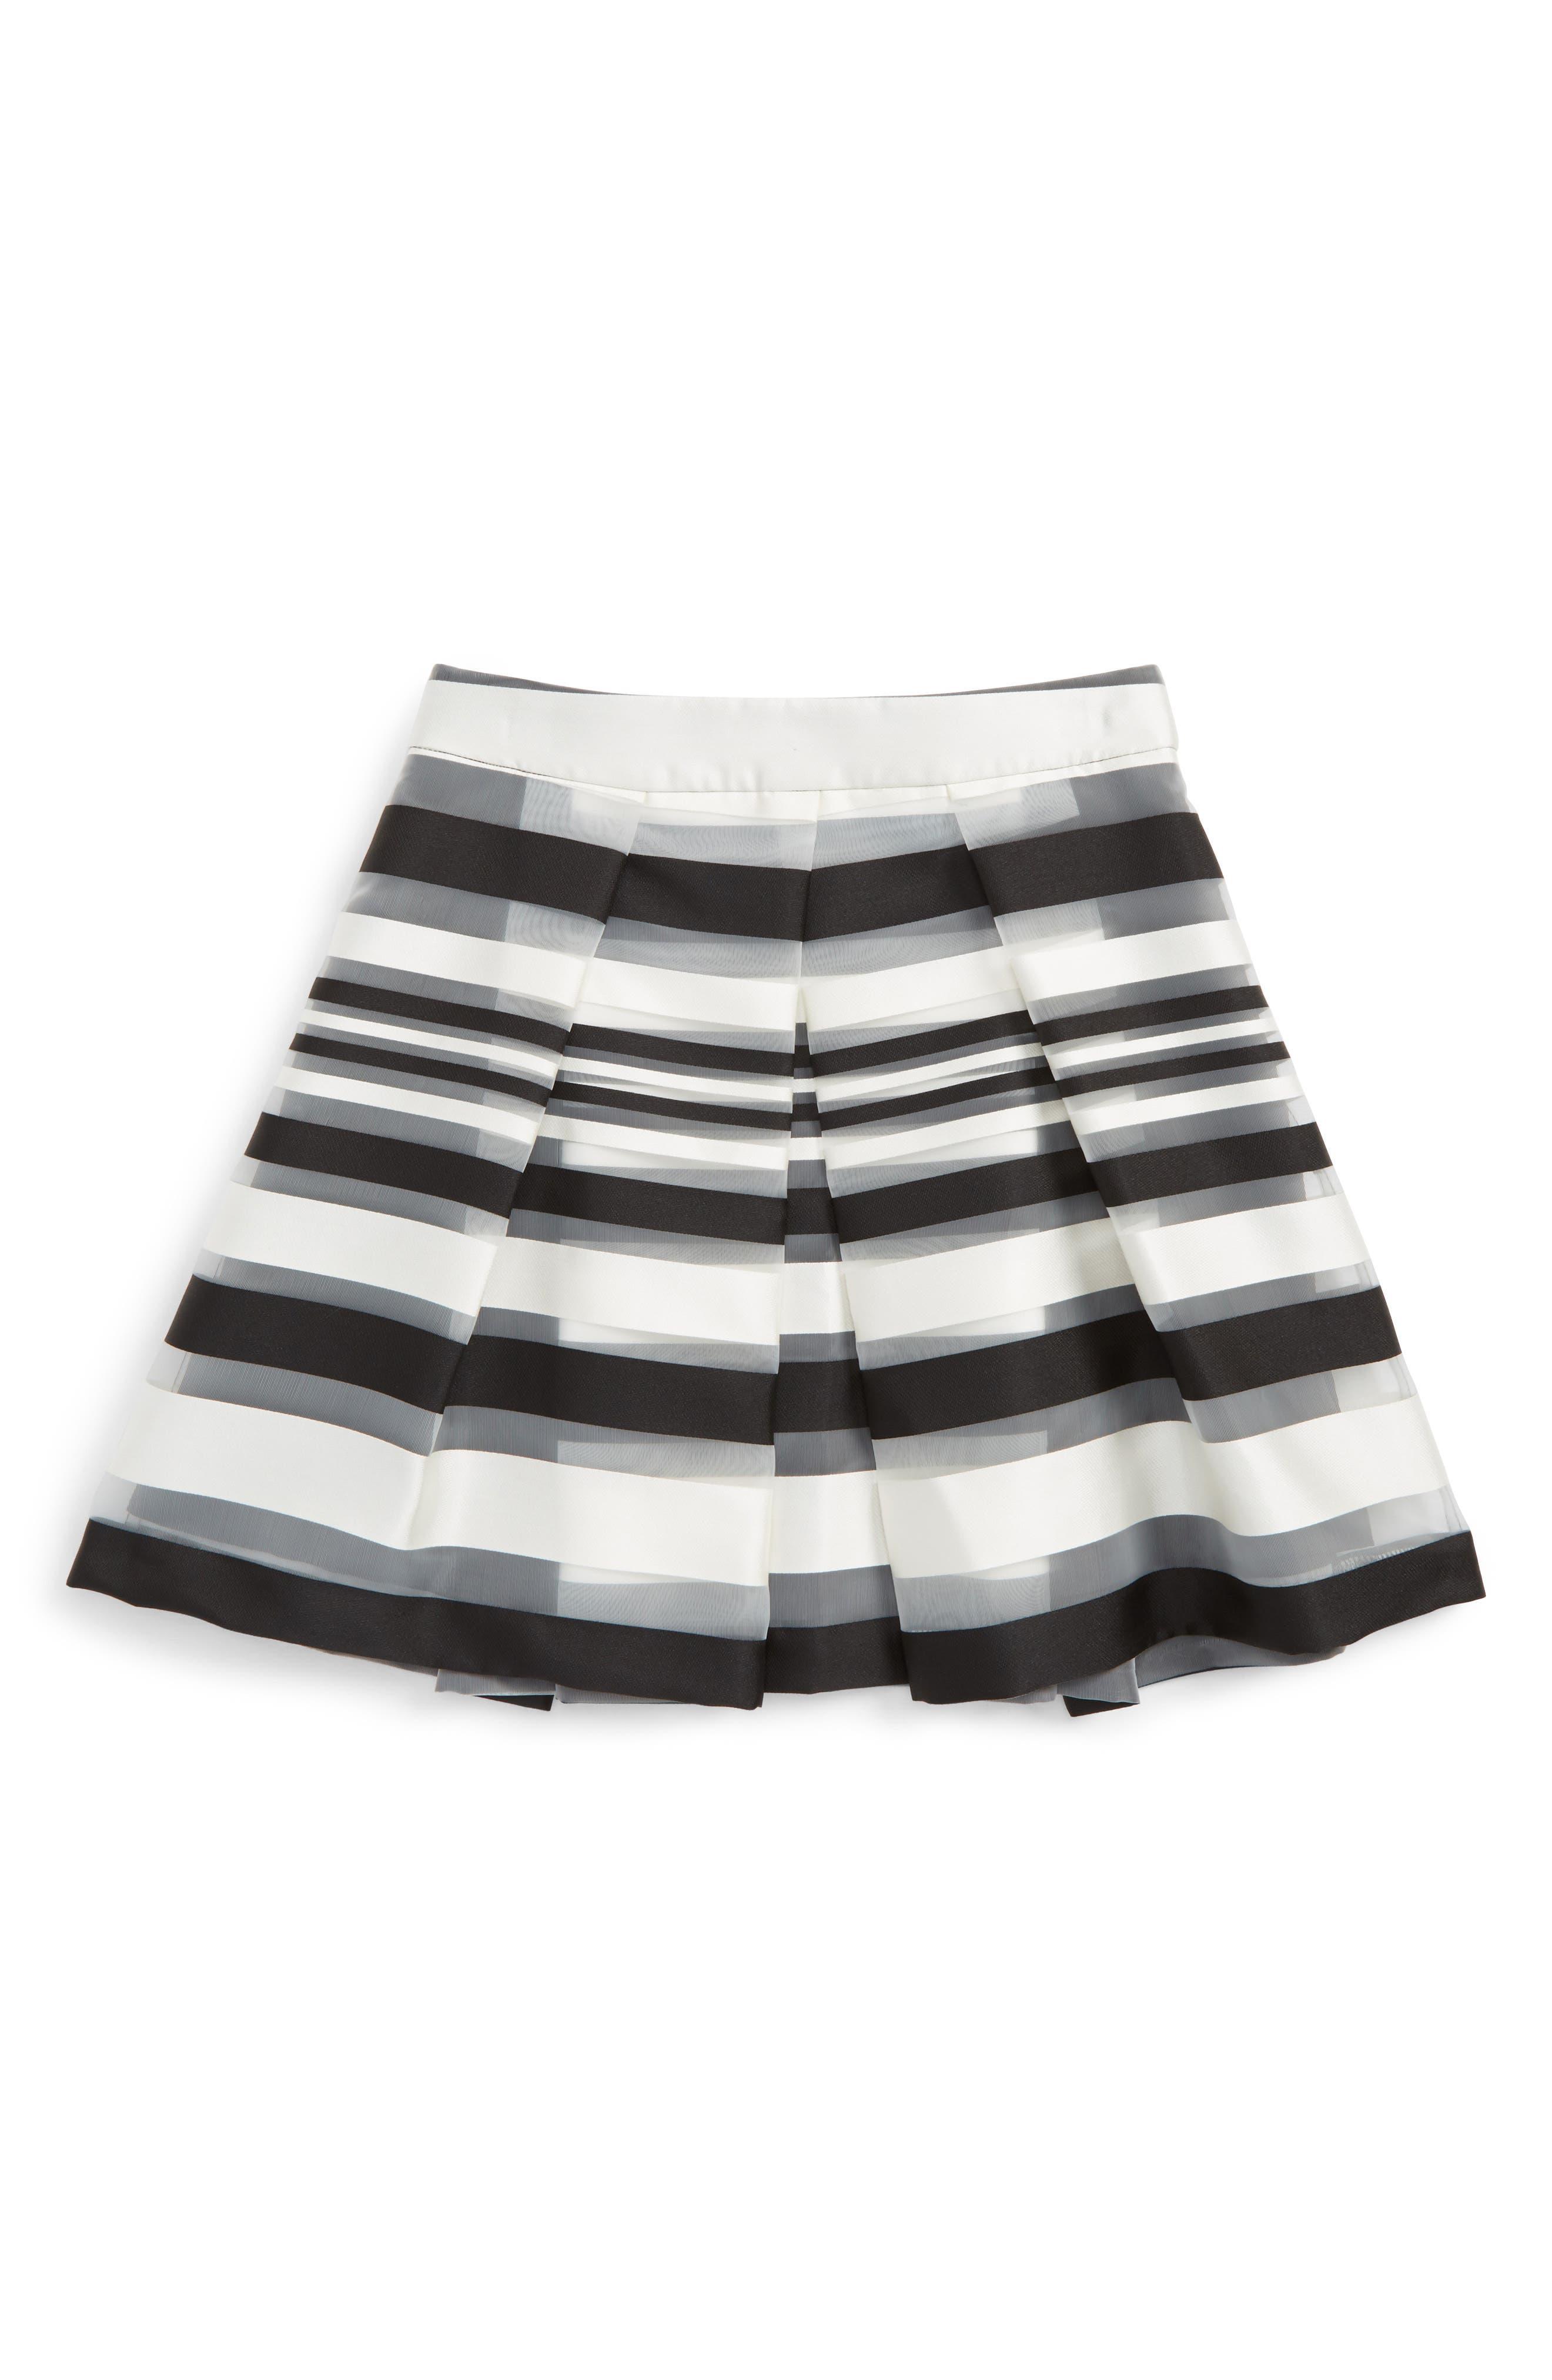 Alternate Image 1 Selected - Milly Minis Illusion Stripe Skirt (Big Girls)